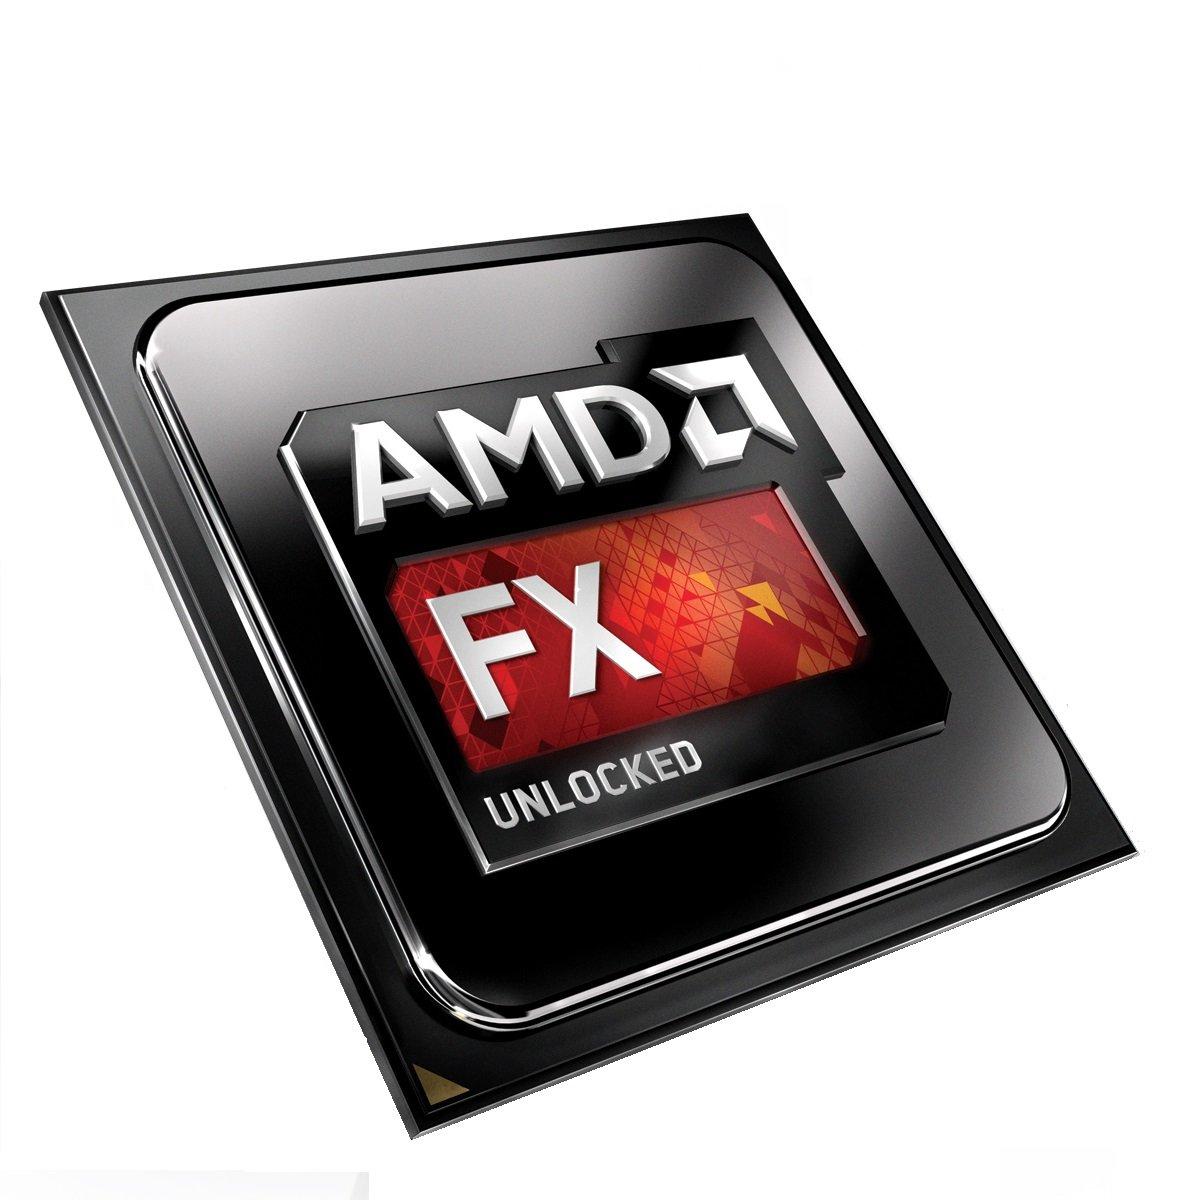 AMD FX-8320E Octa-core (8 Core) 3.20 GHz Processor - Socket AM3+ - Retail Pack by AMD